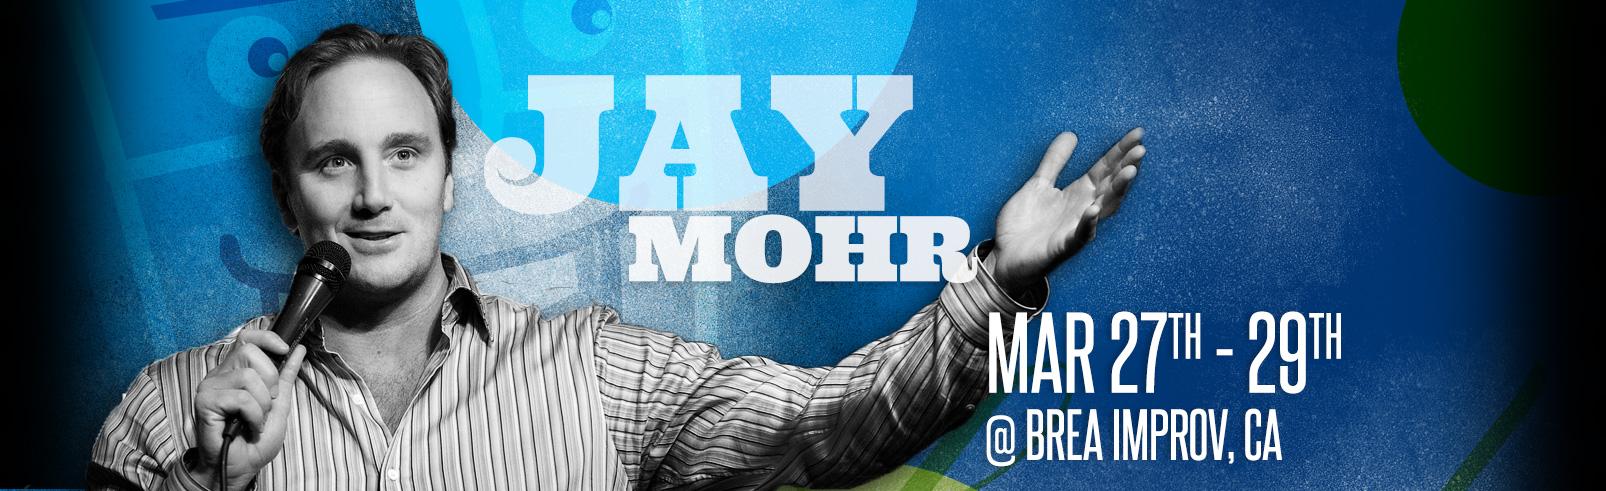 Jay Mohr @ Brea Improv